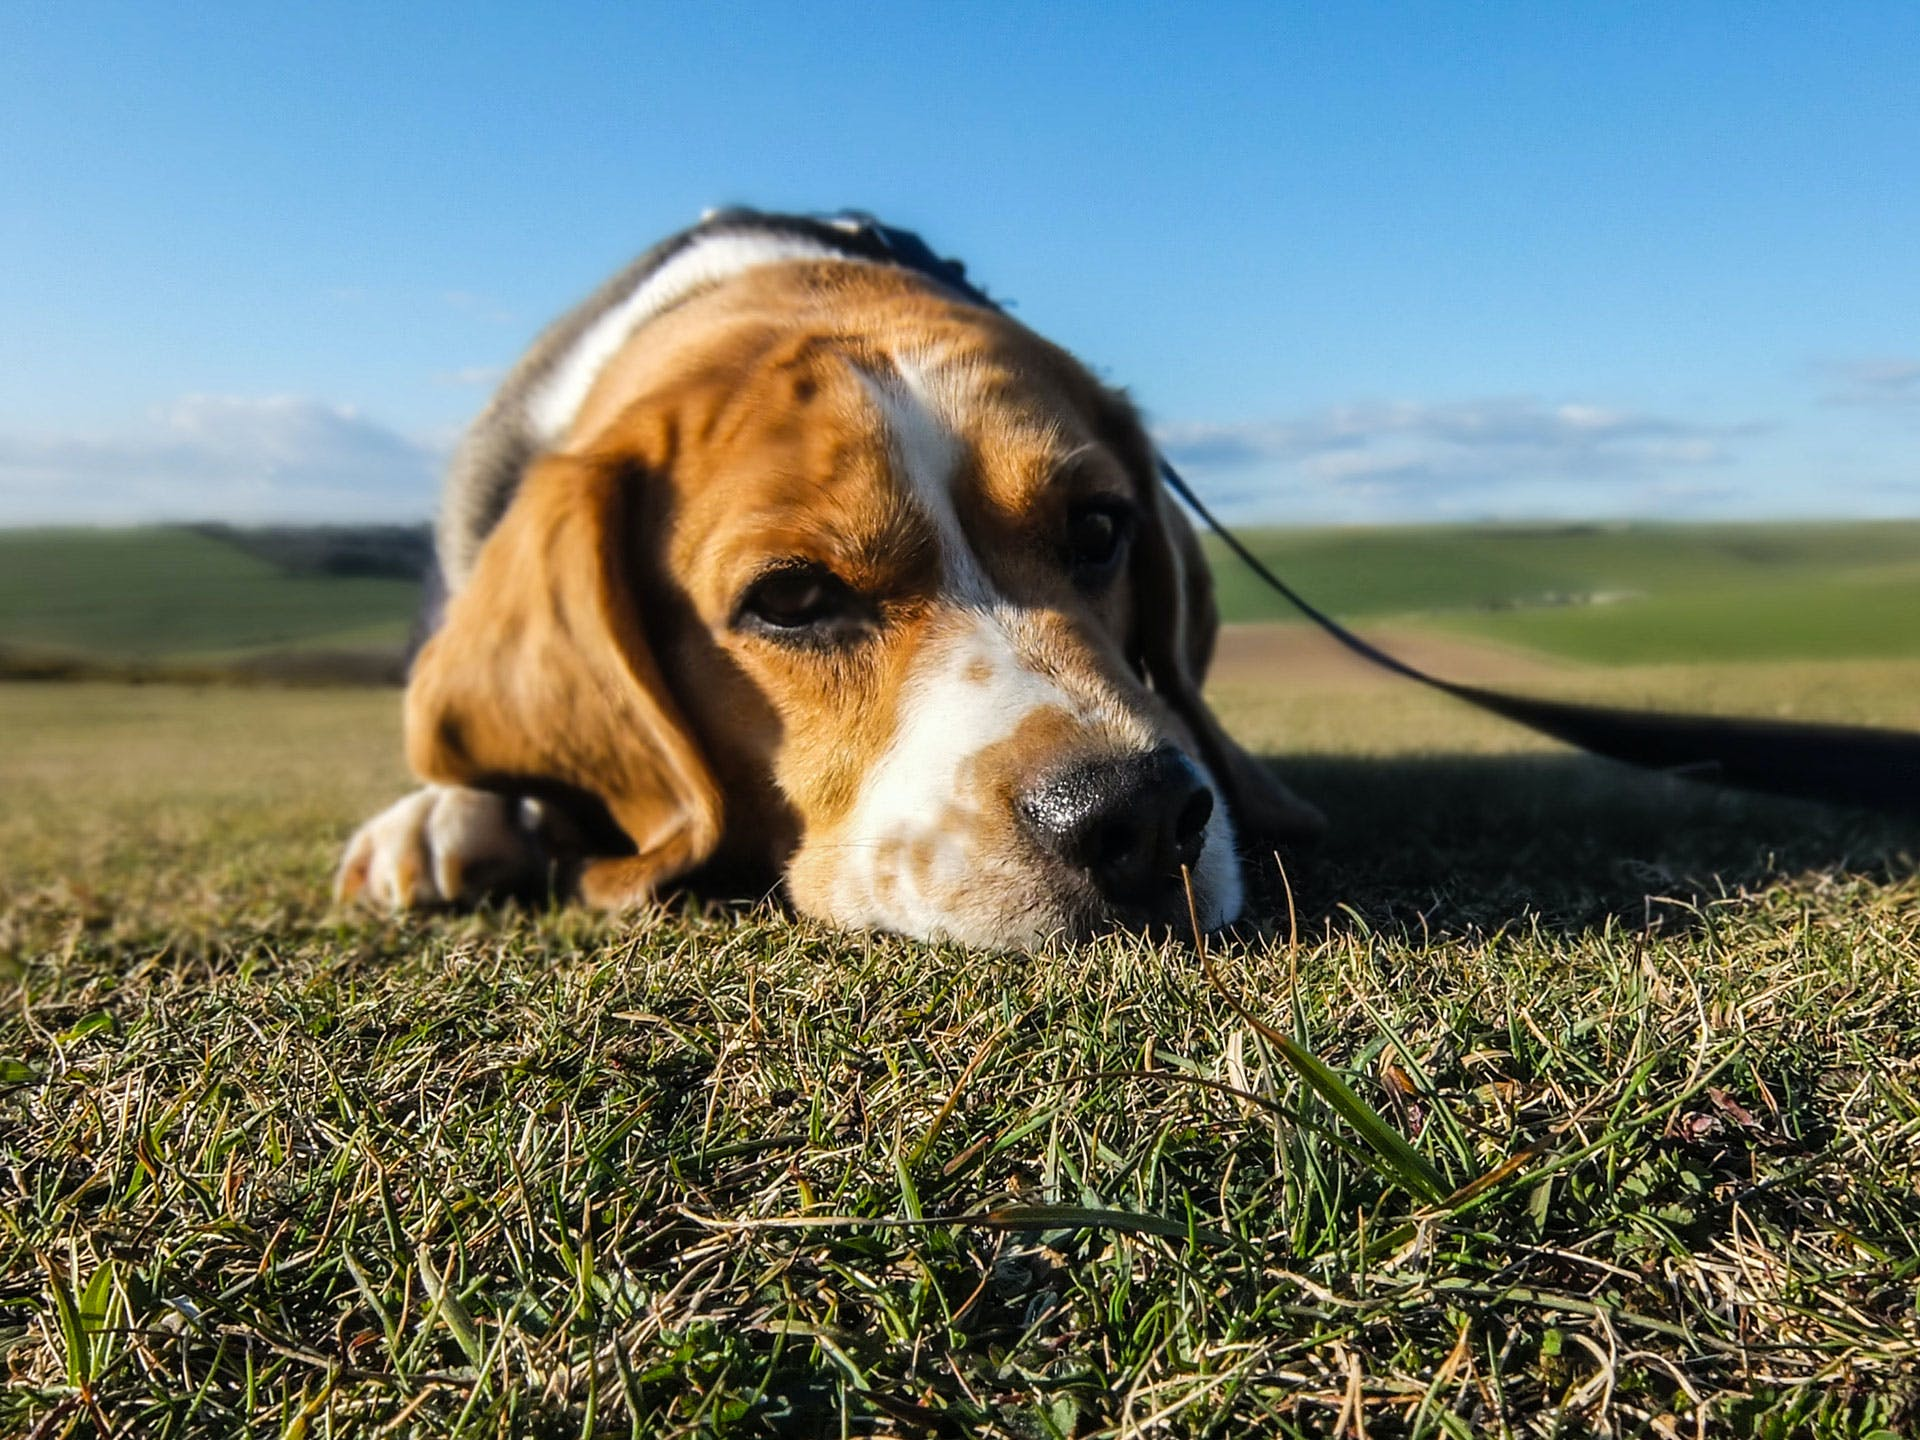 Picture: https://www.pexels.com/photo/animal-dog-pet-sad-7289/